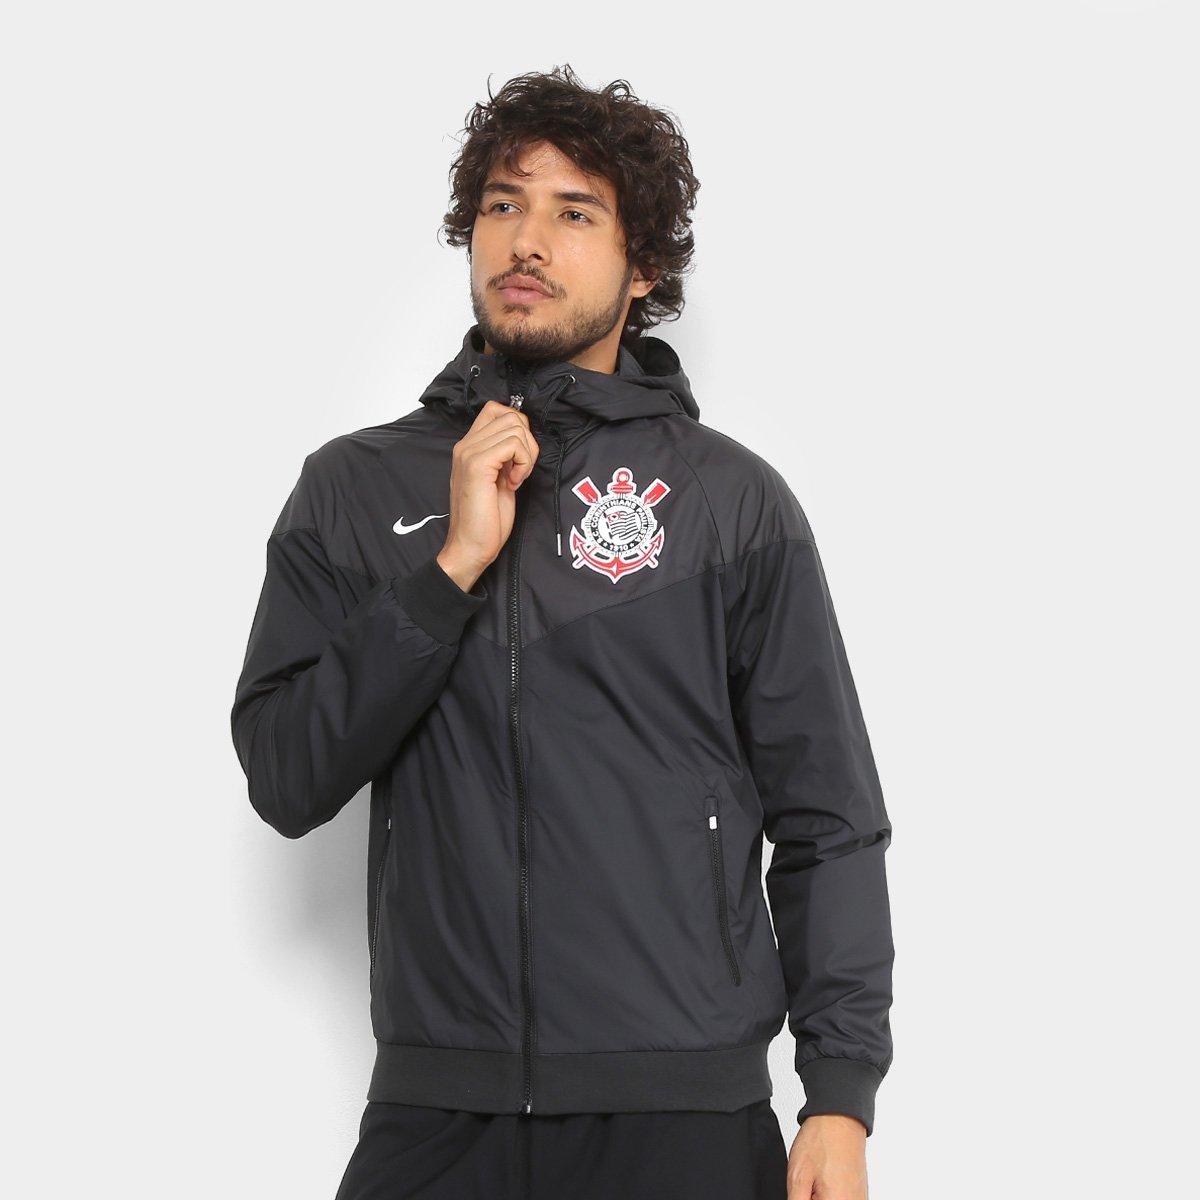 68c30e43bd59af Jaqueta Corinthians Nike Sportwear c/ Capuz Masculina   Shop Timão